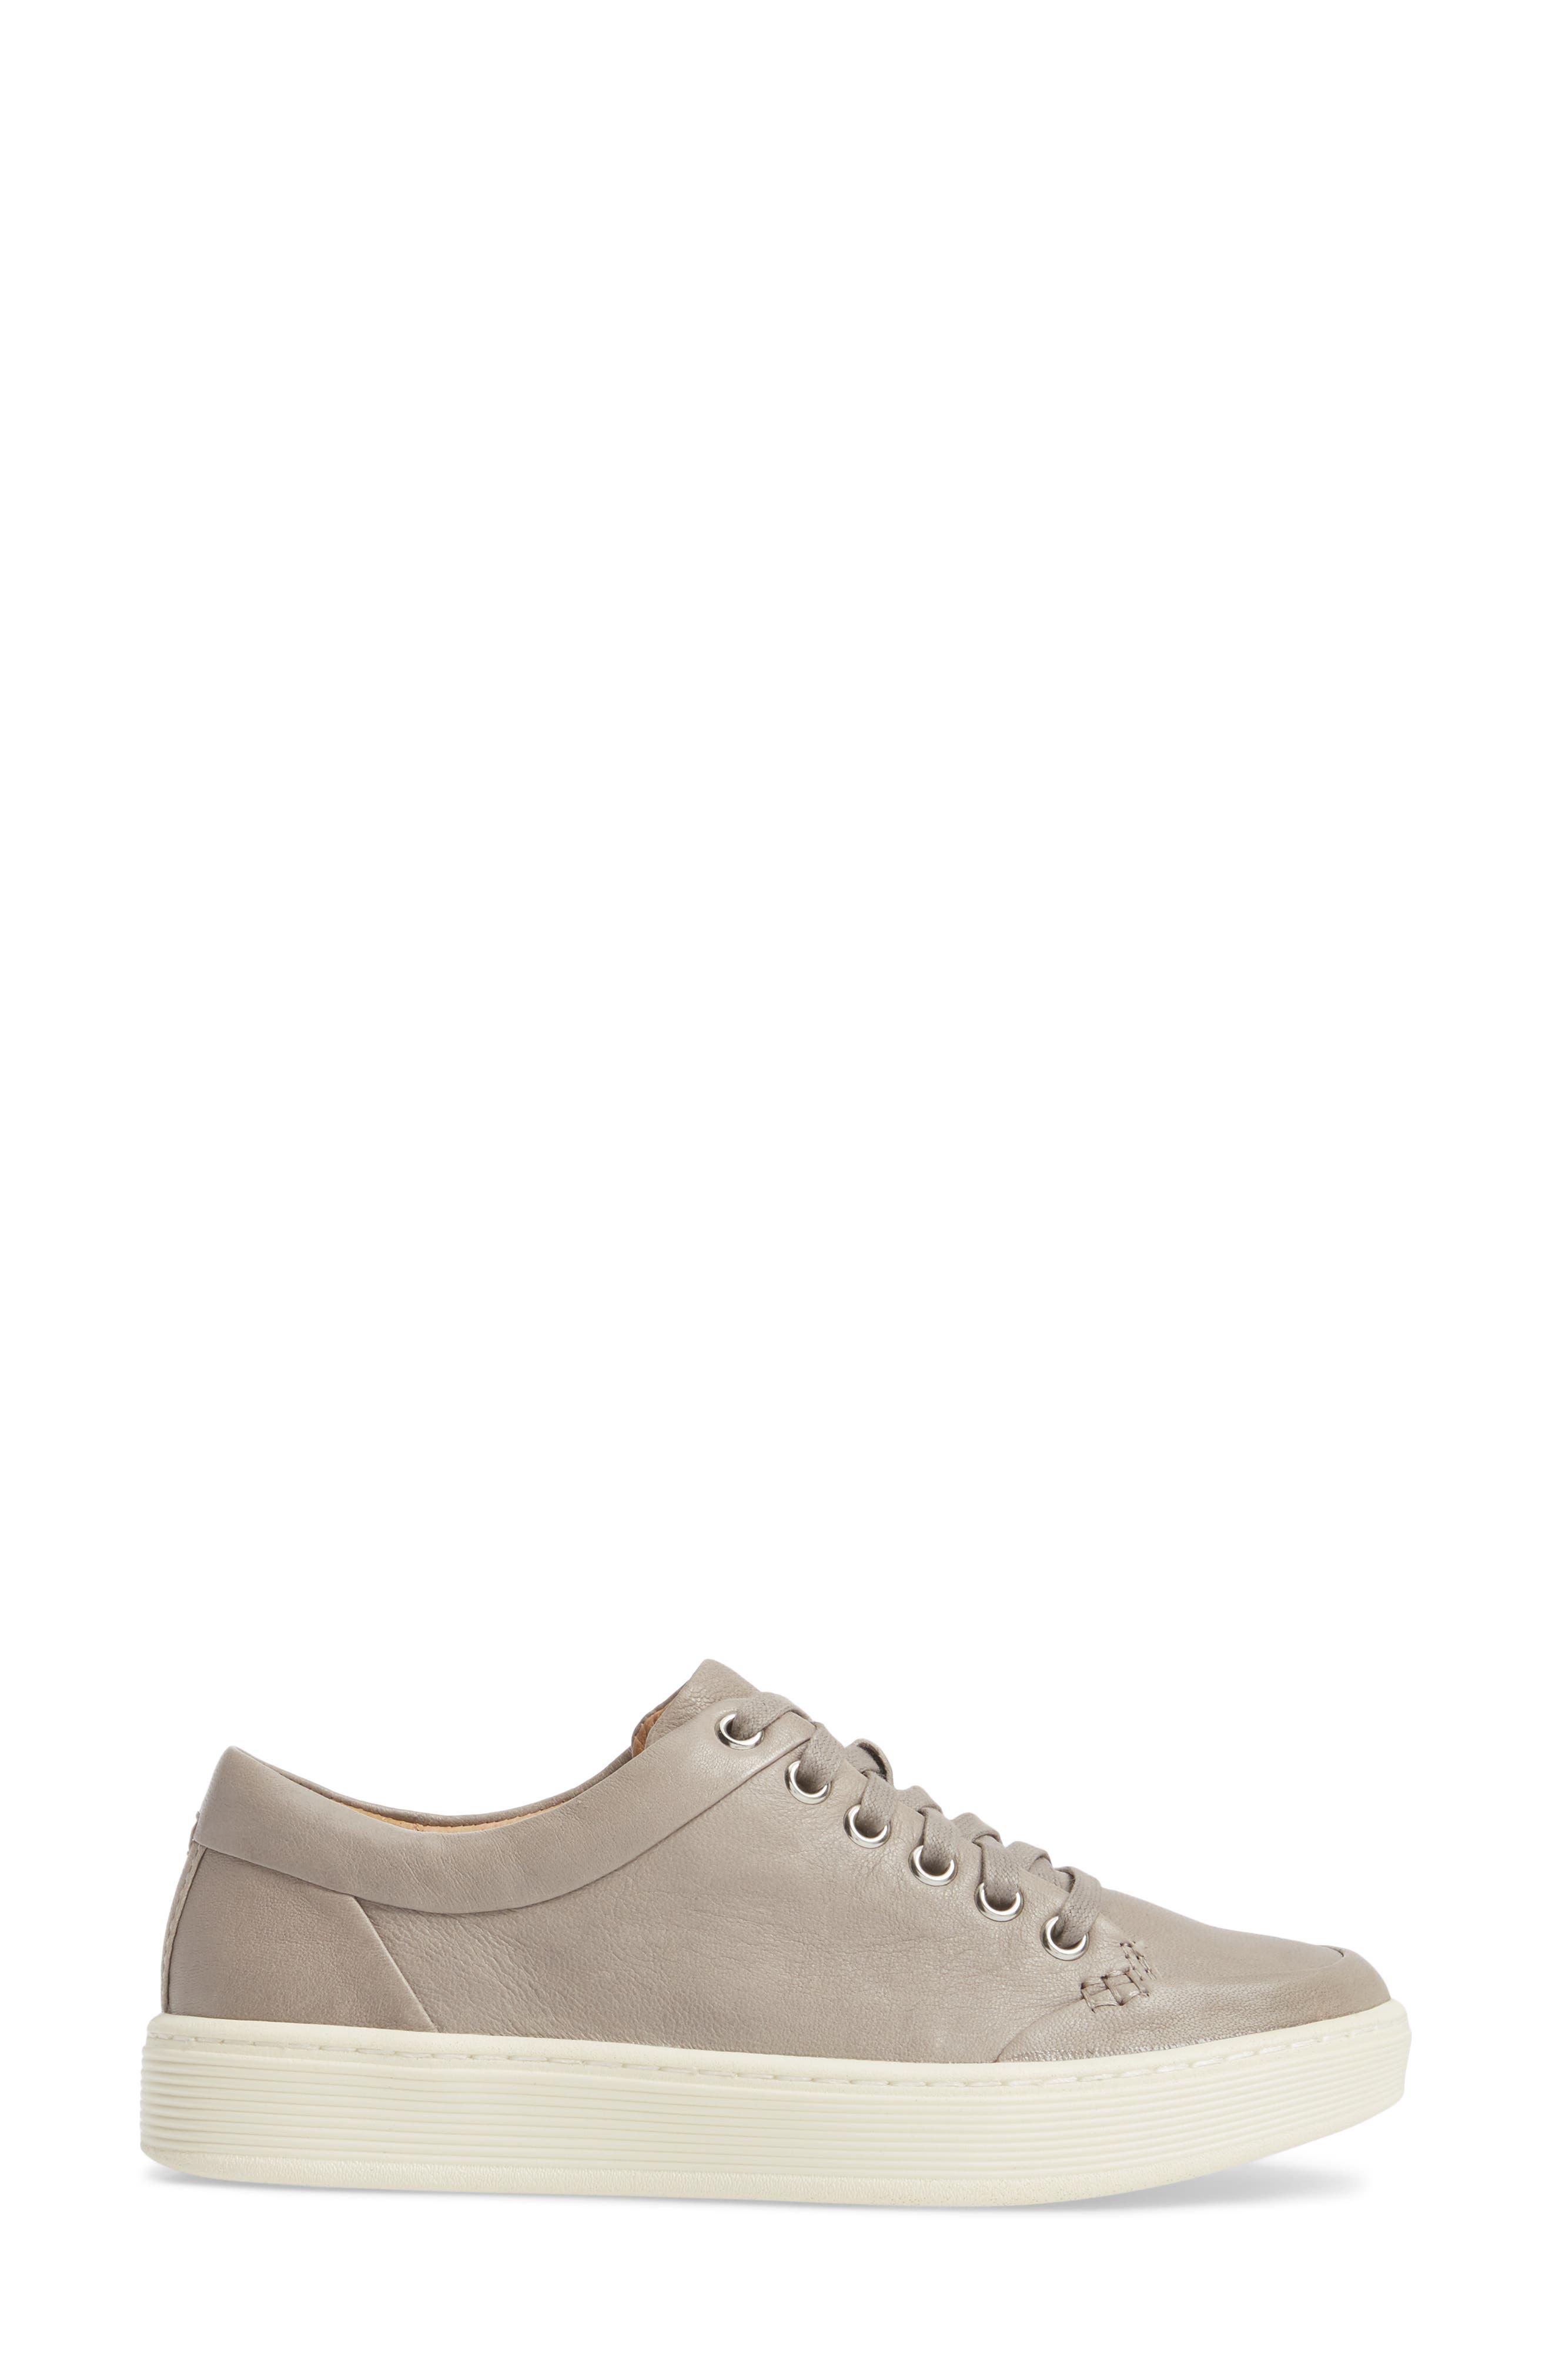 Sanders Sneaker,                             Alternate thumbnail 3, color,                             ZINCO GREY LEATHER